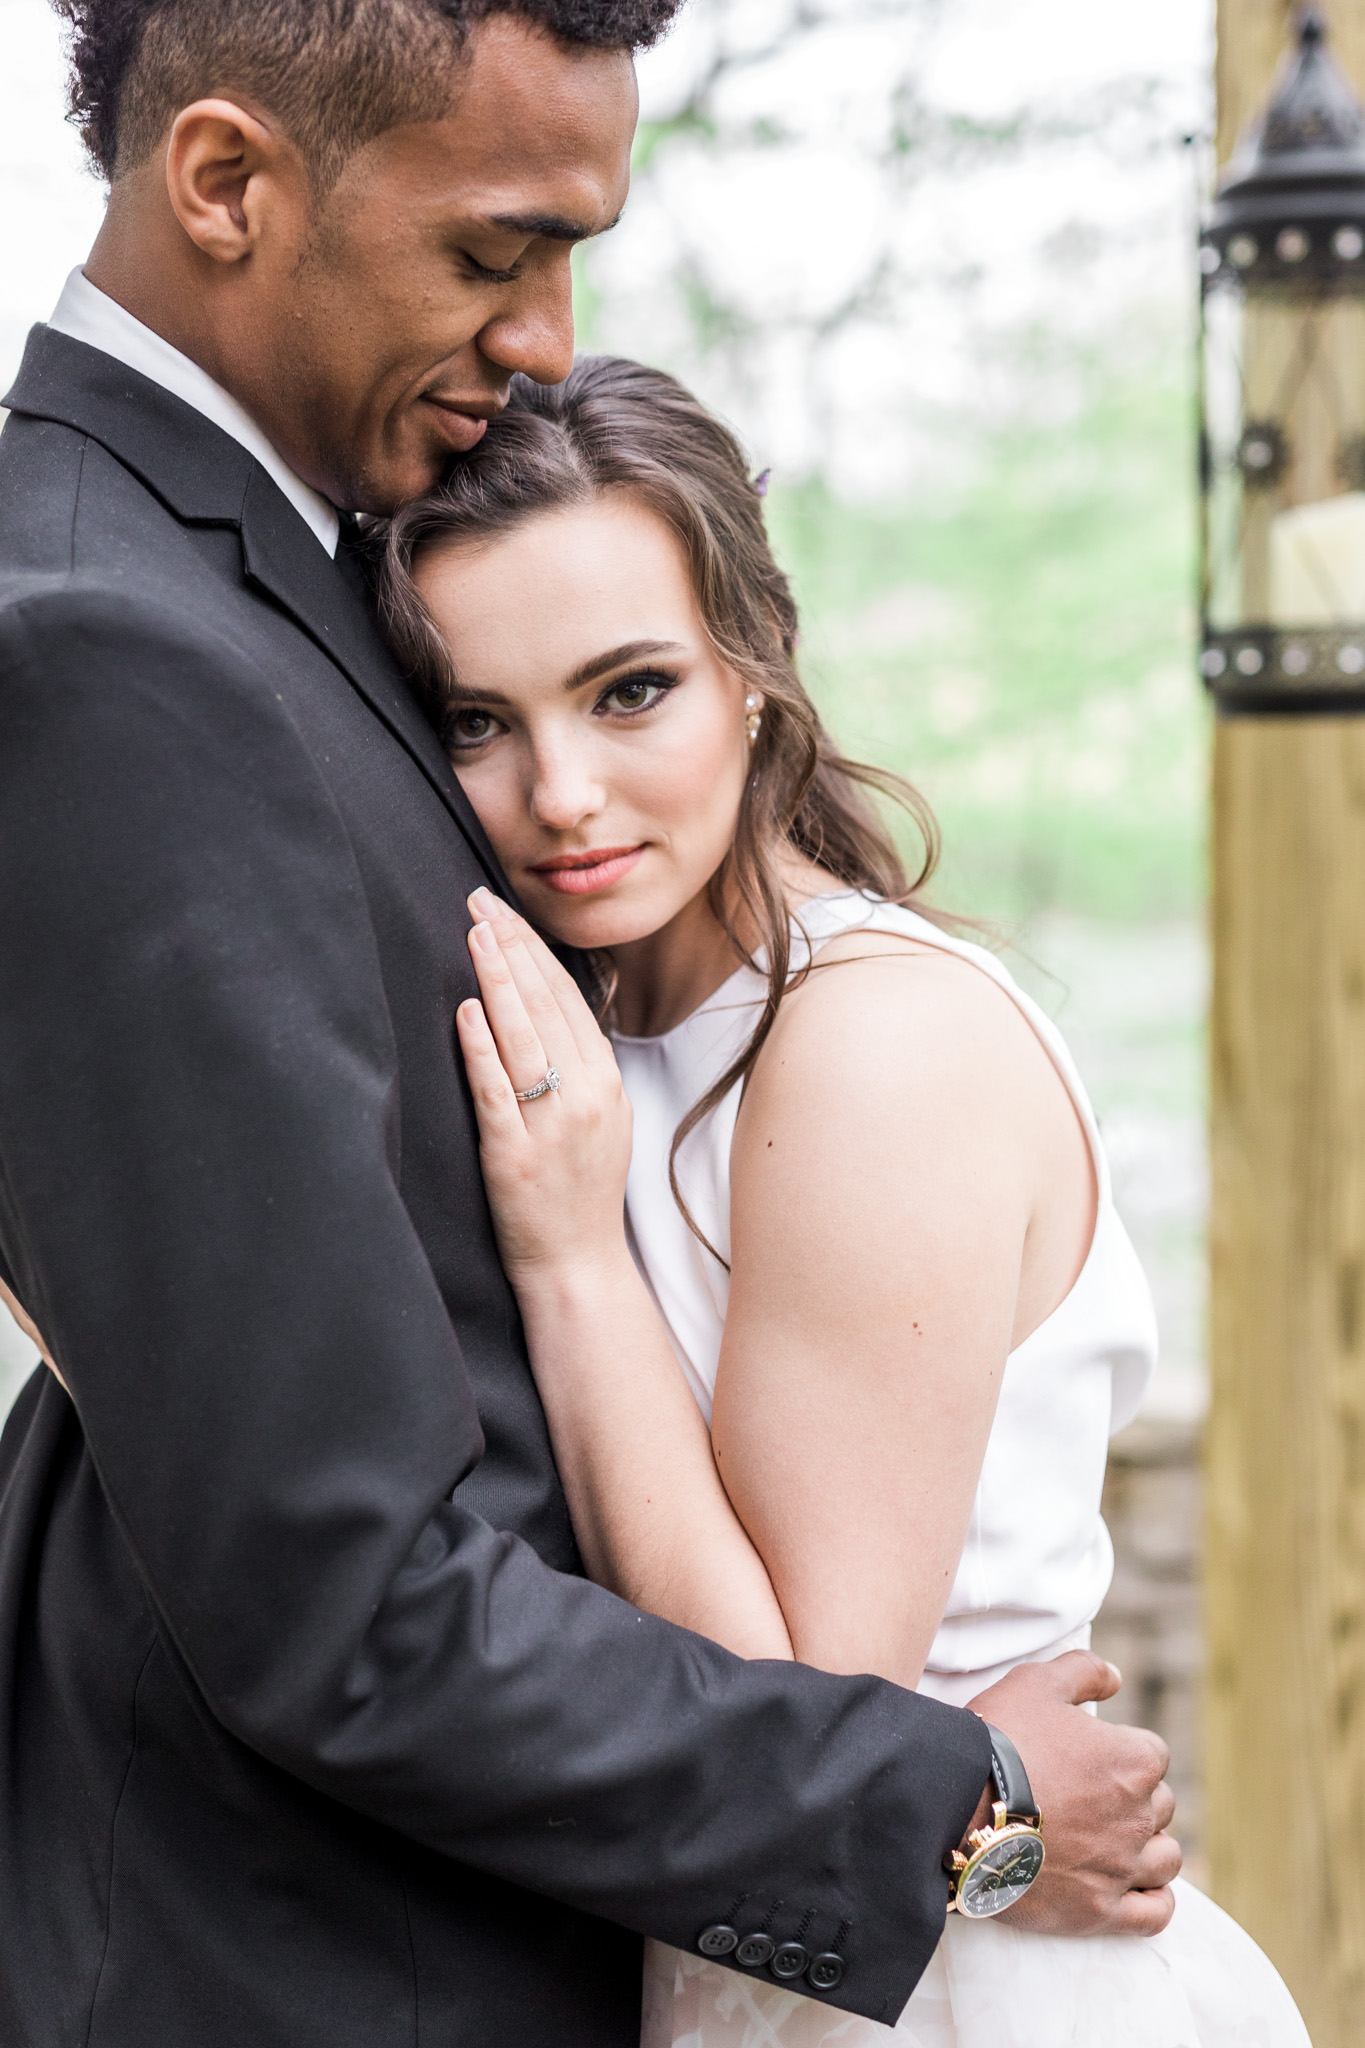 Styled Wedding Shoot at Gable Hill Barn | Elegant Chic Wedding | Laurenda Marie Photography | West Michigan Wedding Photographer |